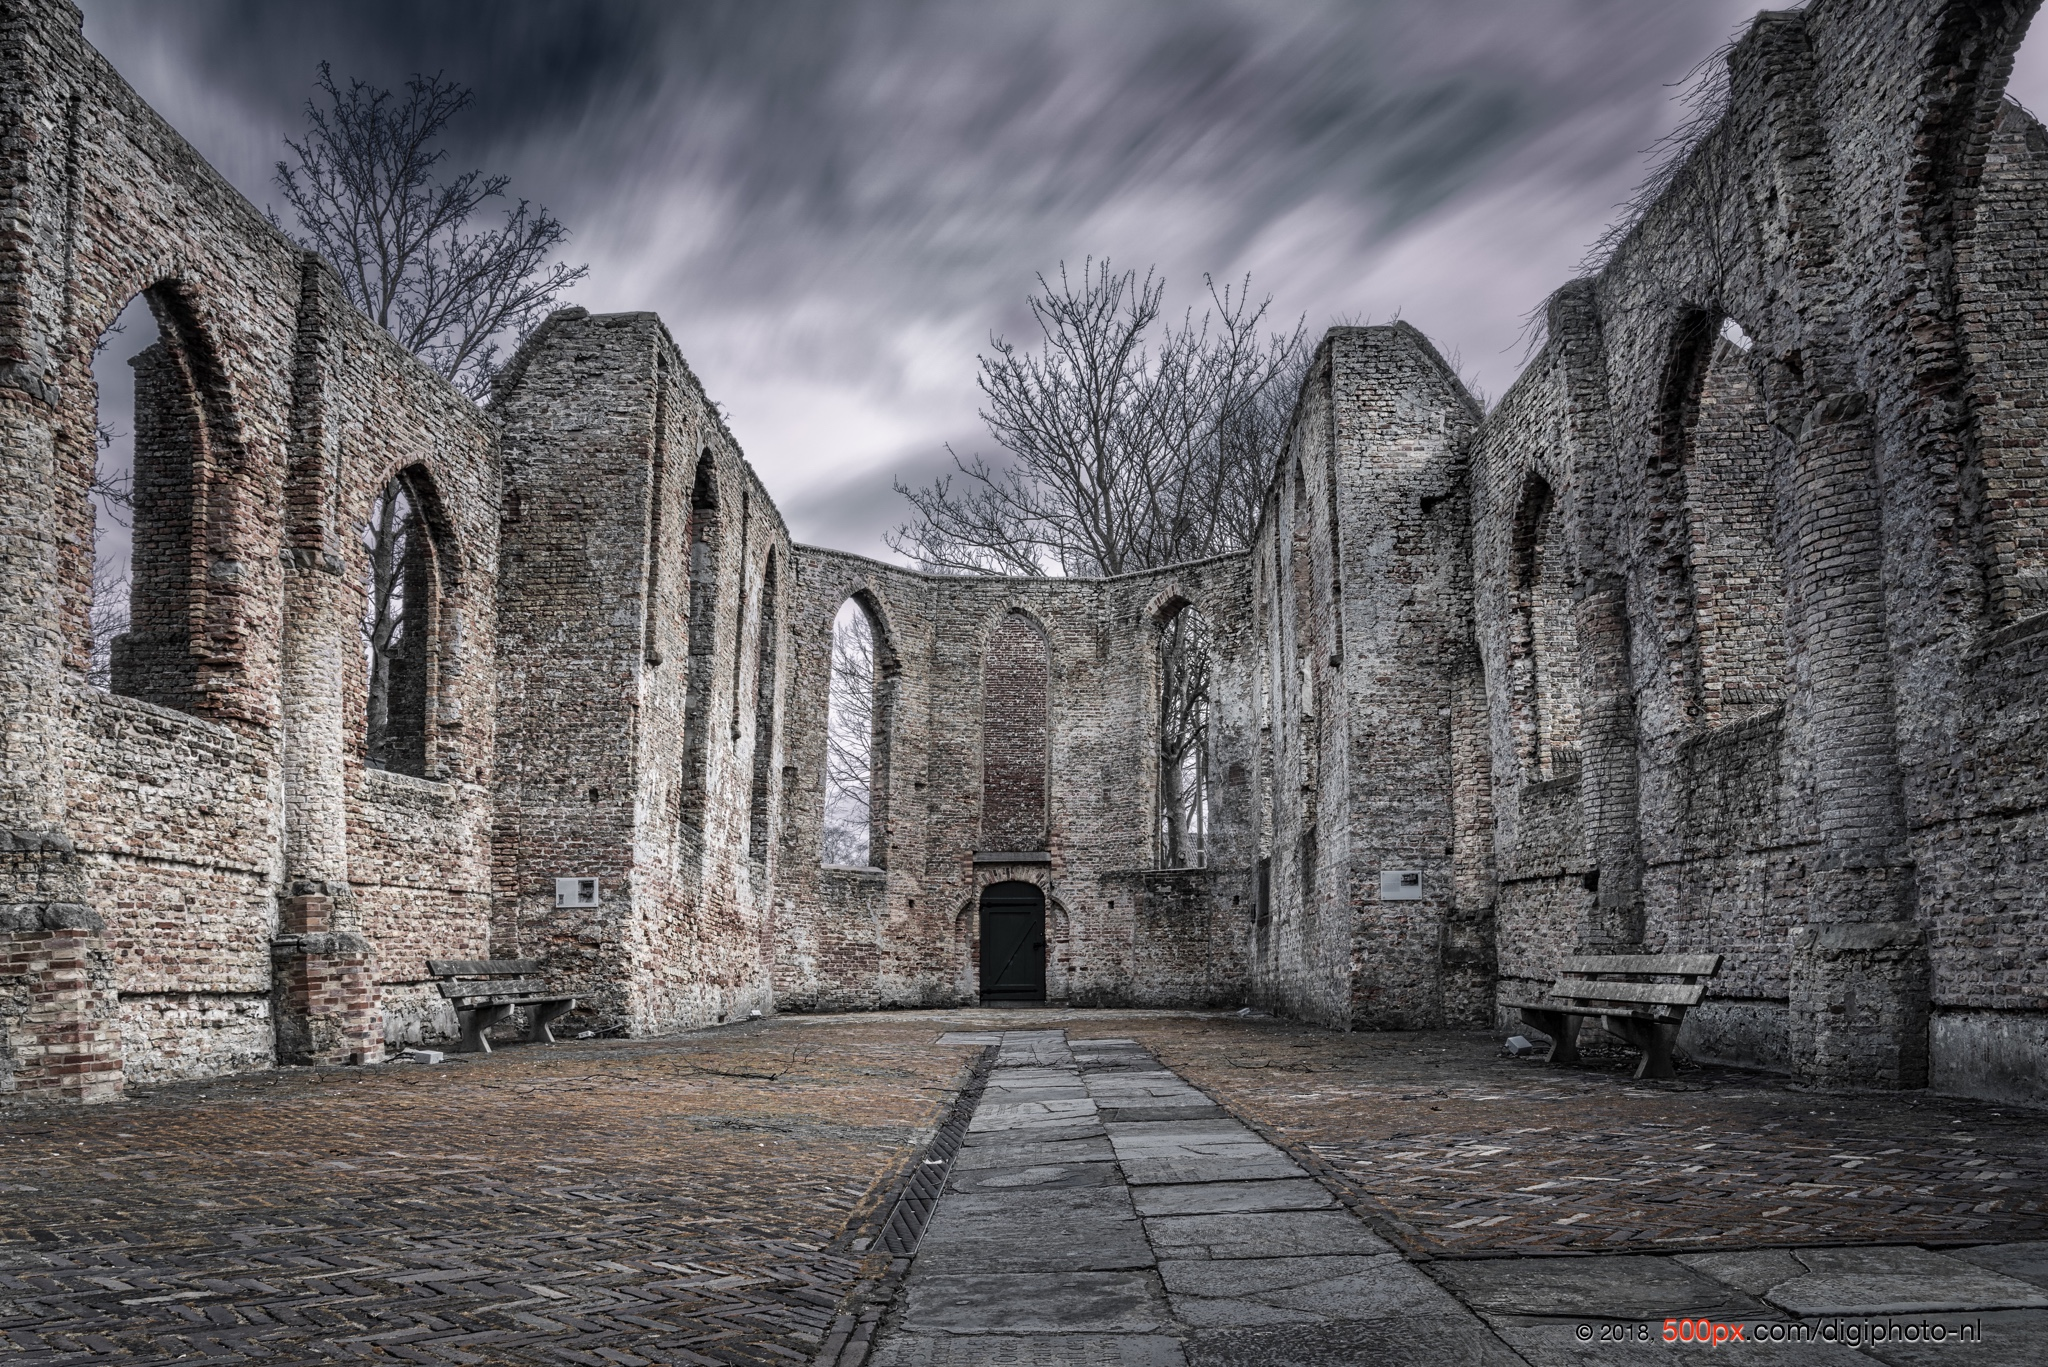 Ruïnekerk in Oude Niedorp, Netherlands